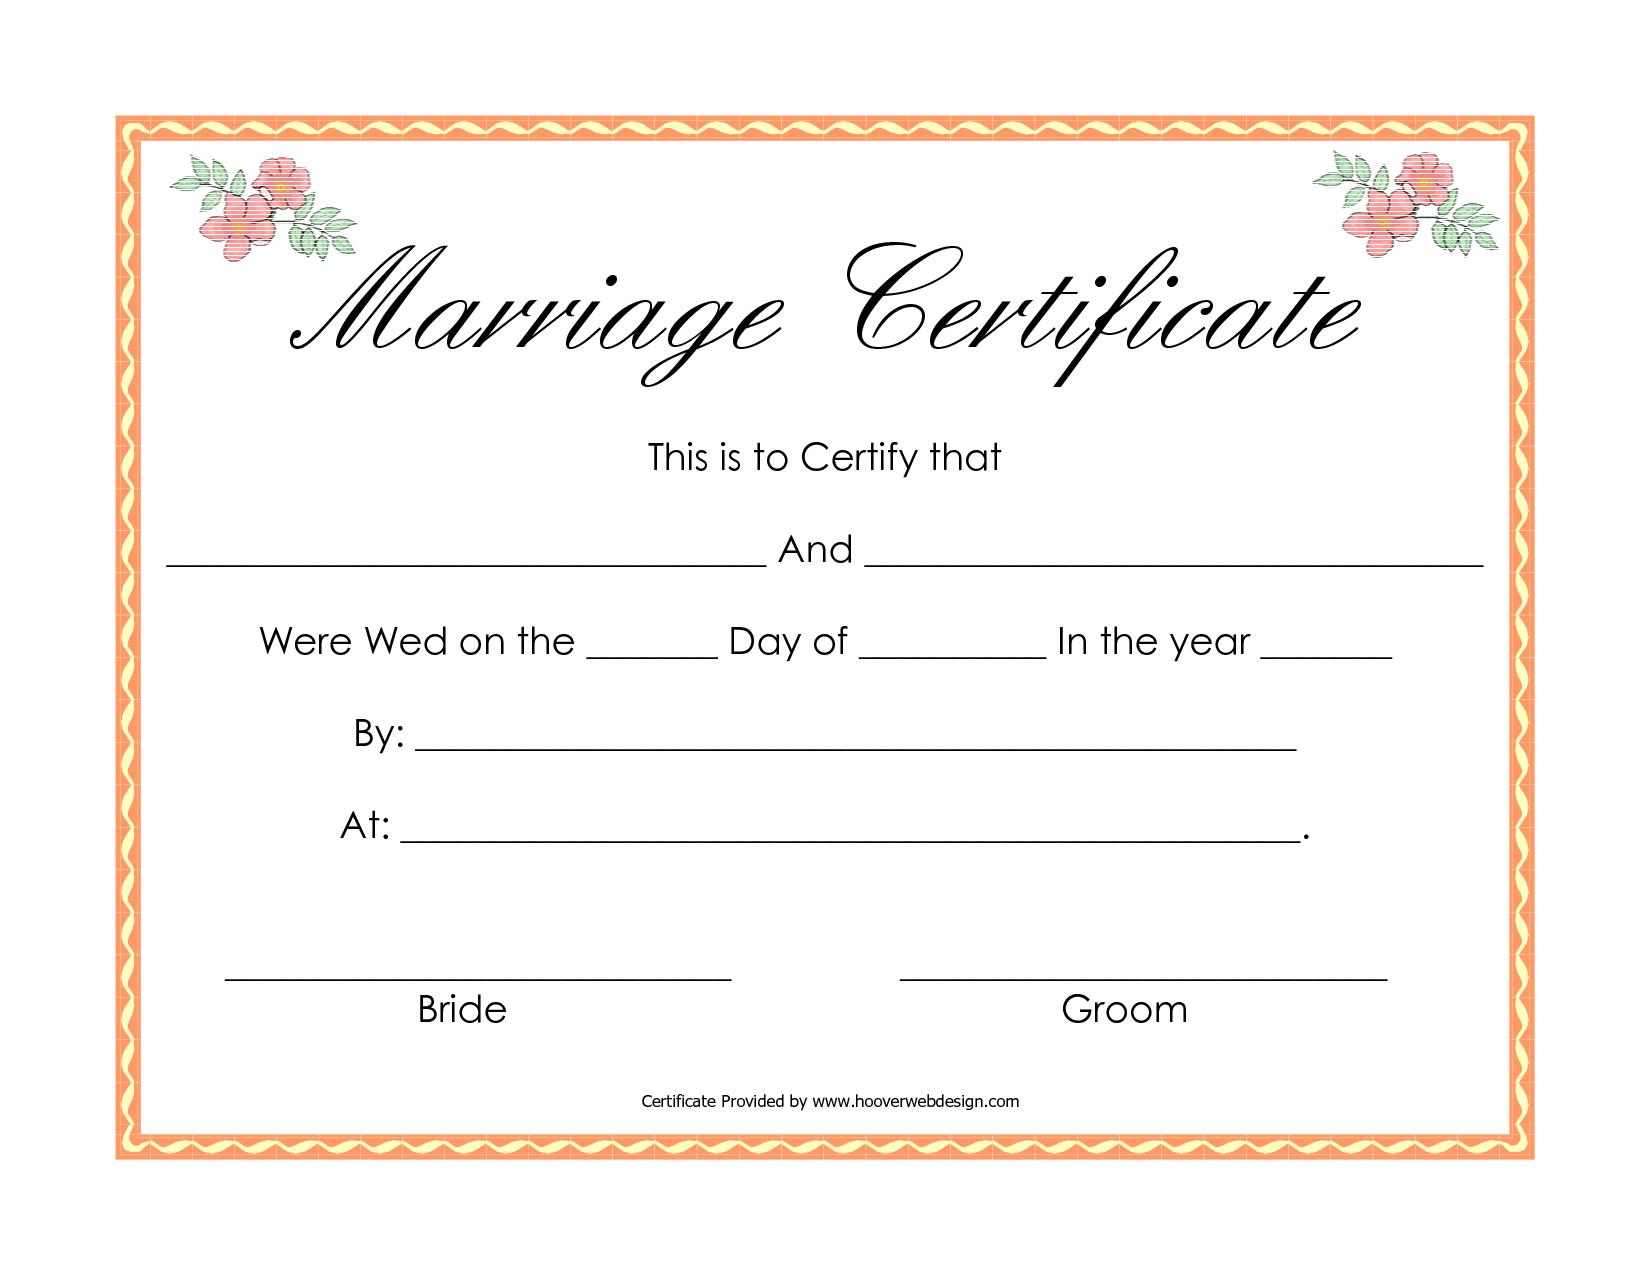 Fake Marriage Certificate | Fake Marriage Certificate | Pinterest - Fake Marriage Certificate Printable Free